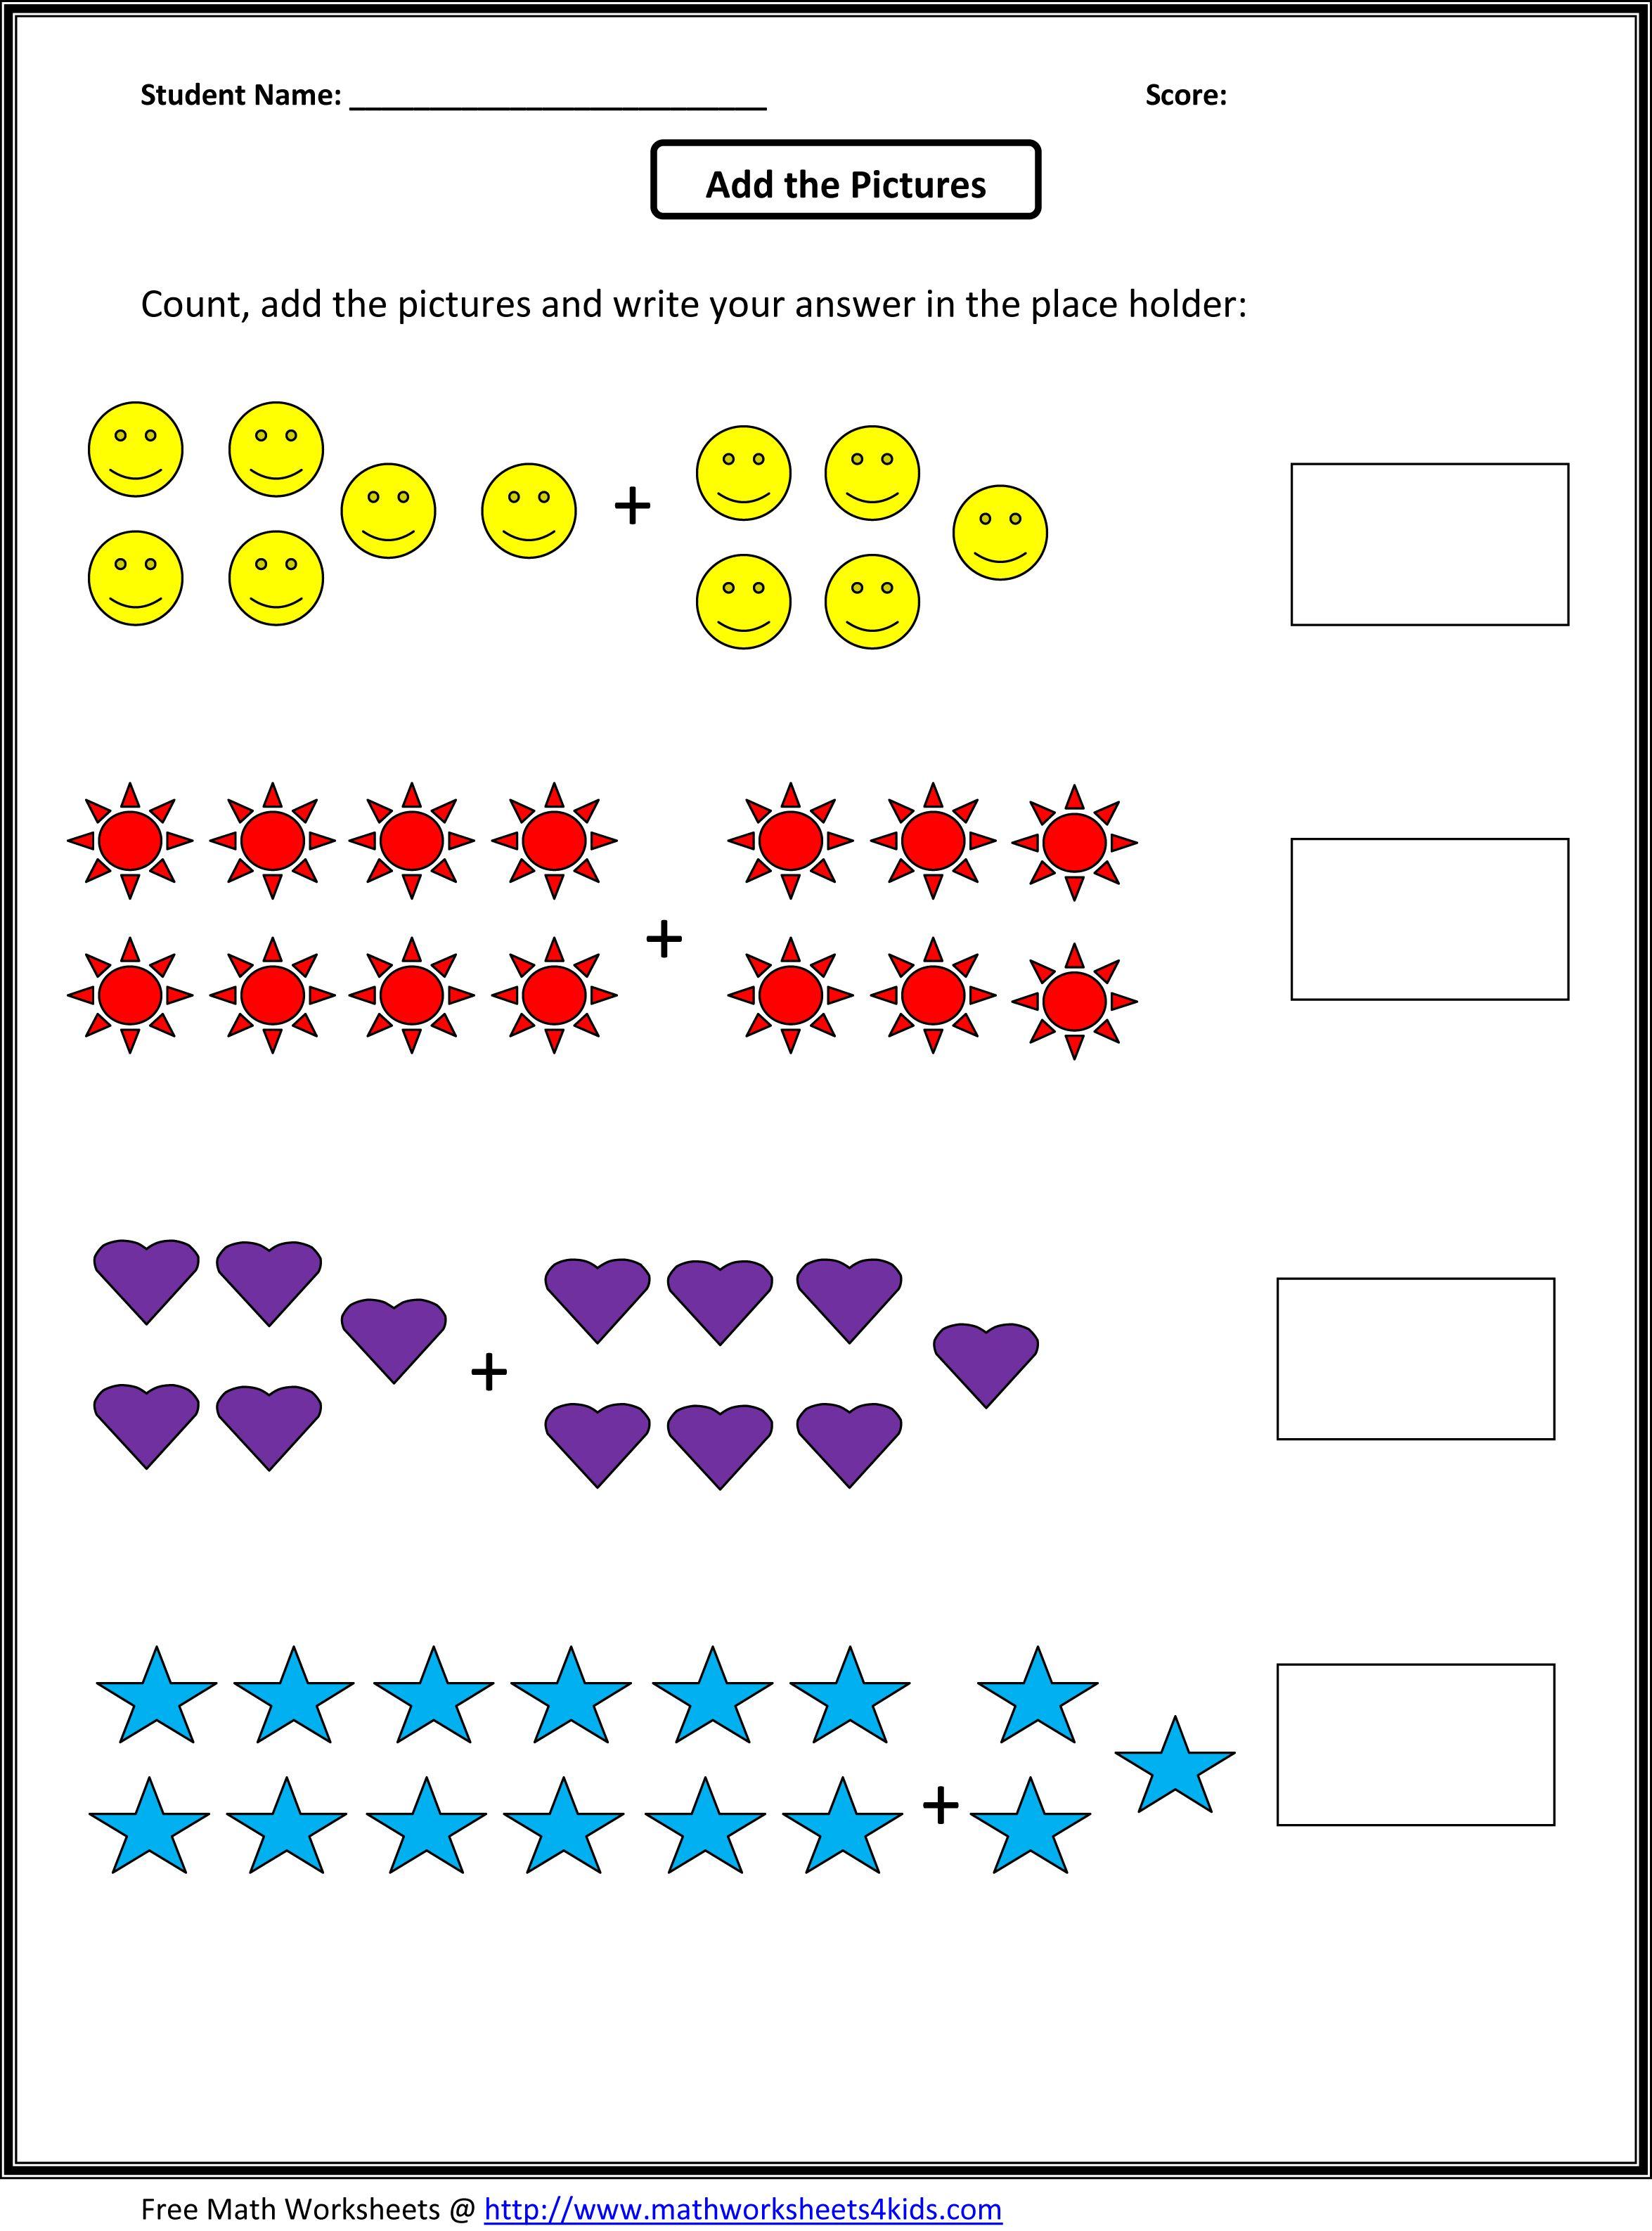 Math Worksheets Grade 1 Printable 372674